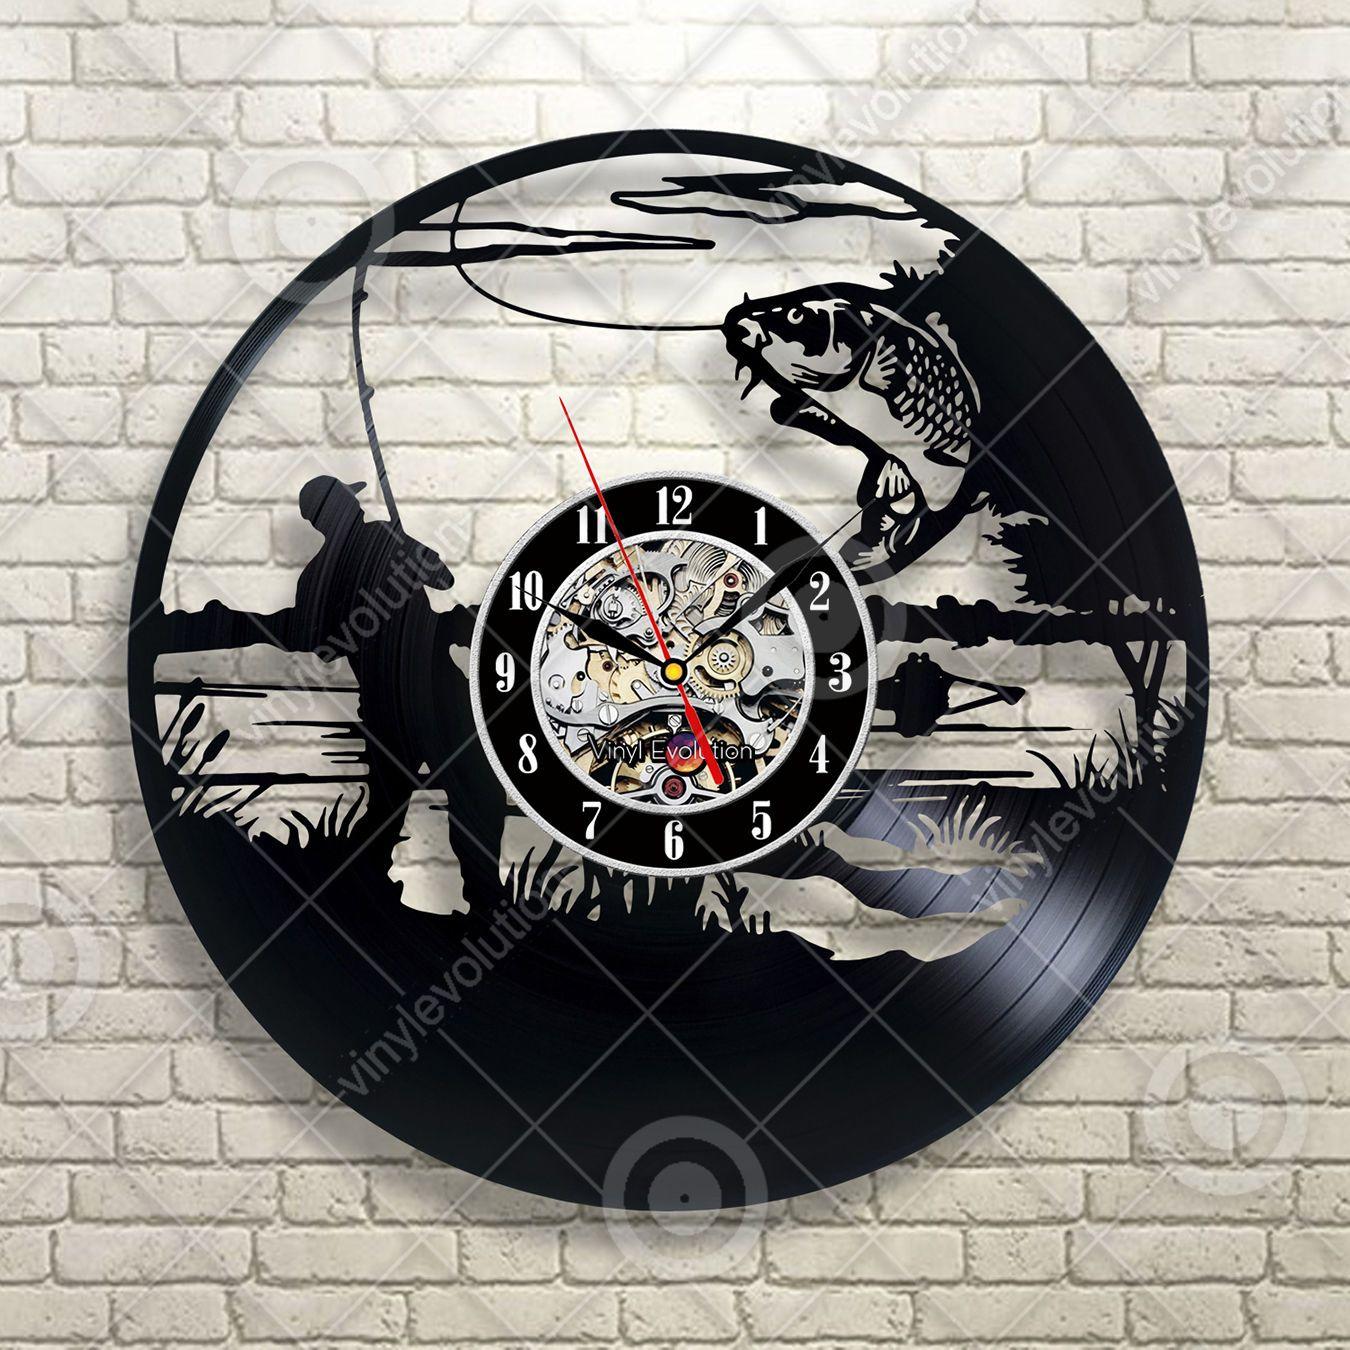 Fishing Vinyl Wall Clock Home Deco Decor Kitchen Living Room Wall ...